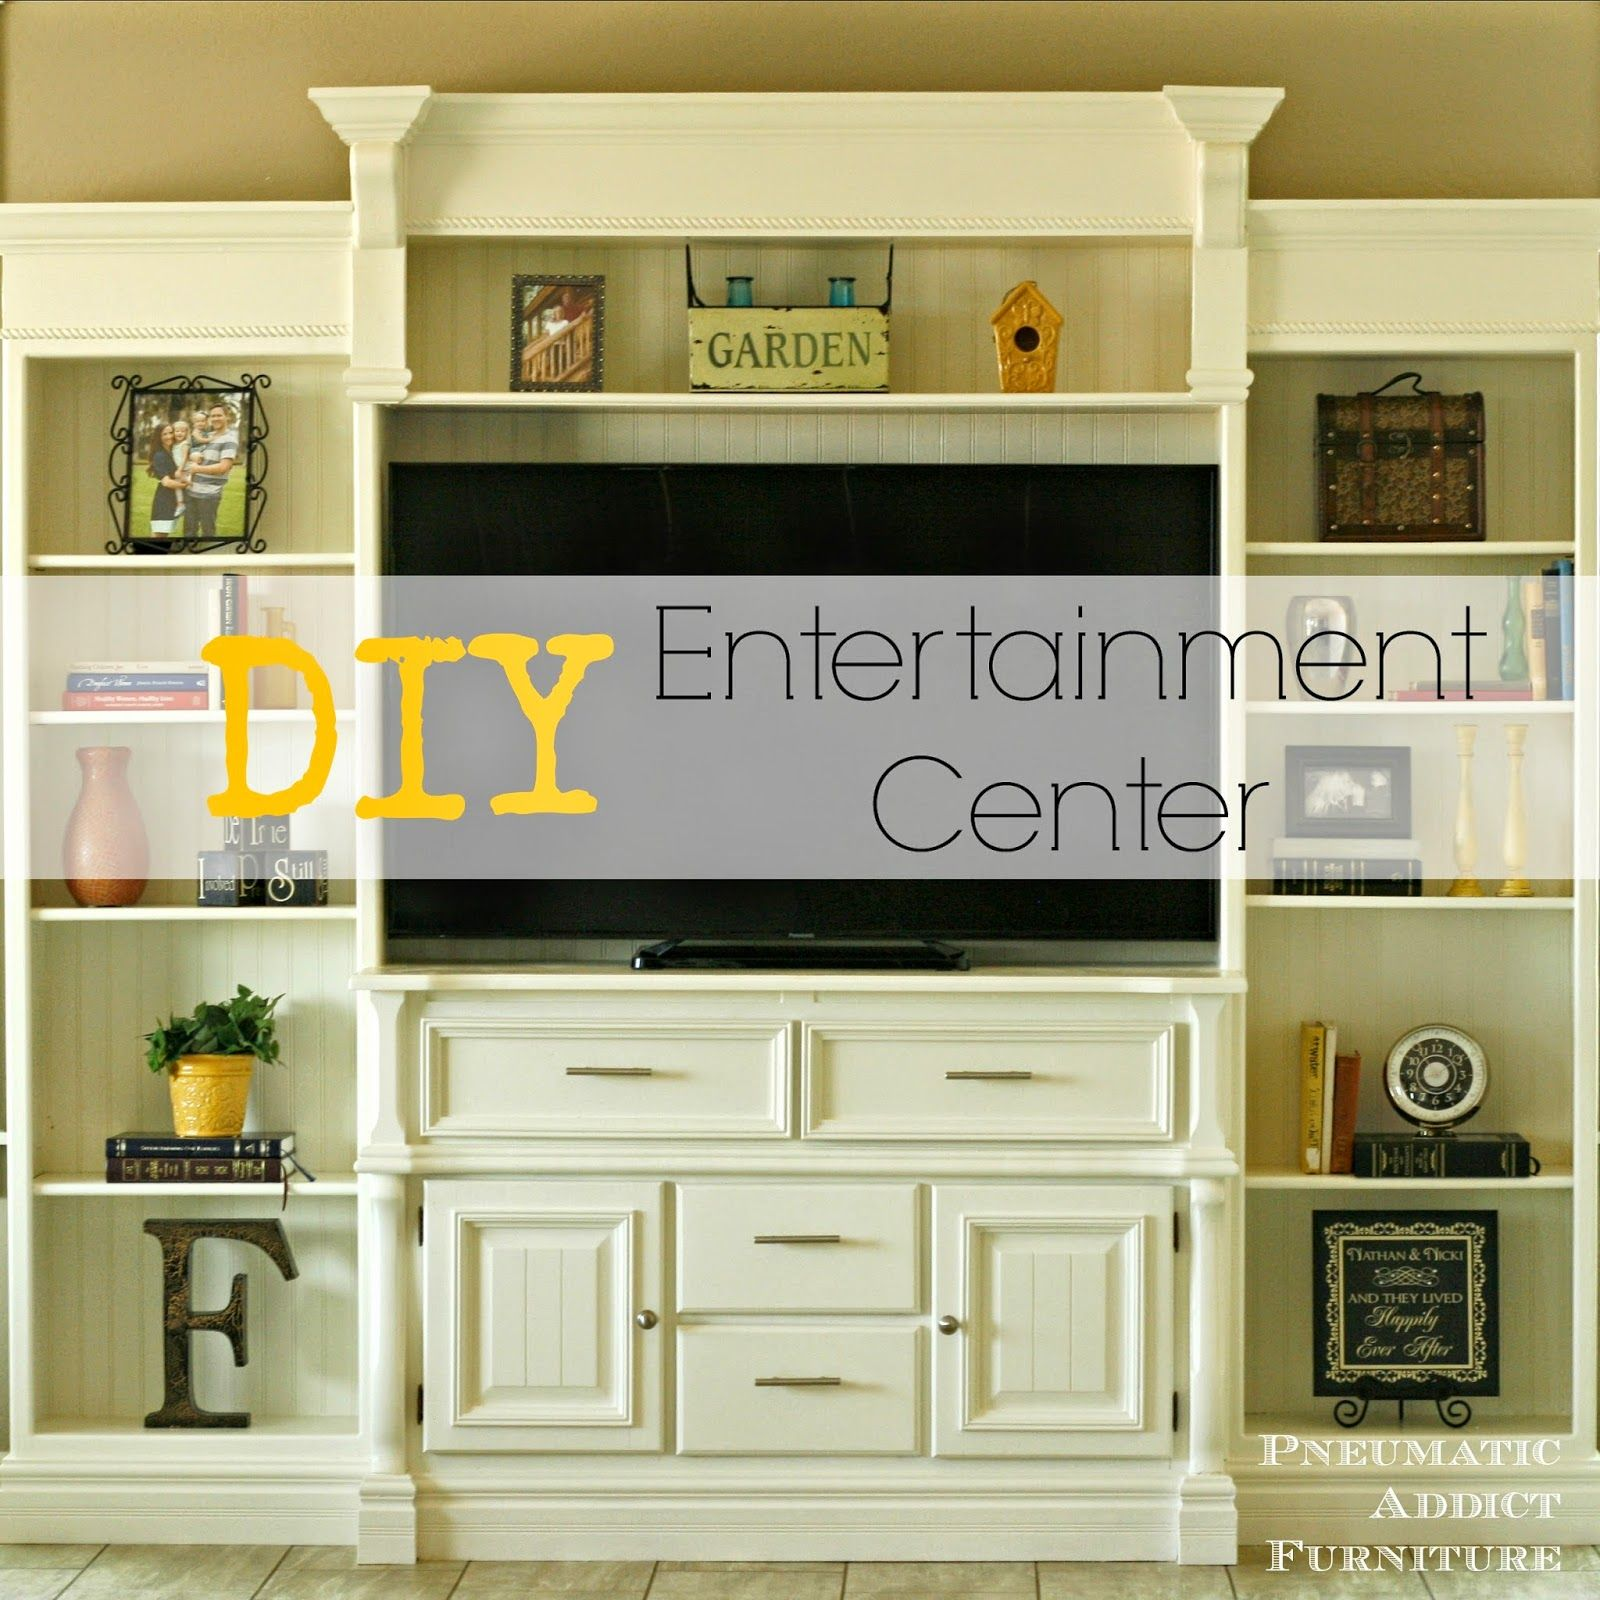 Diy entertainment center stuff pinterest power tools my best